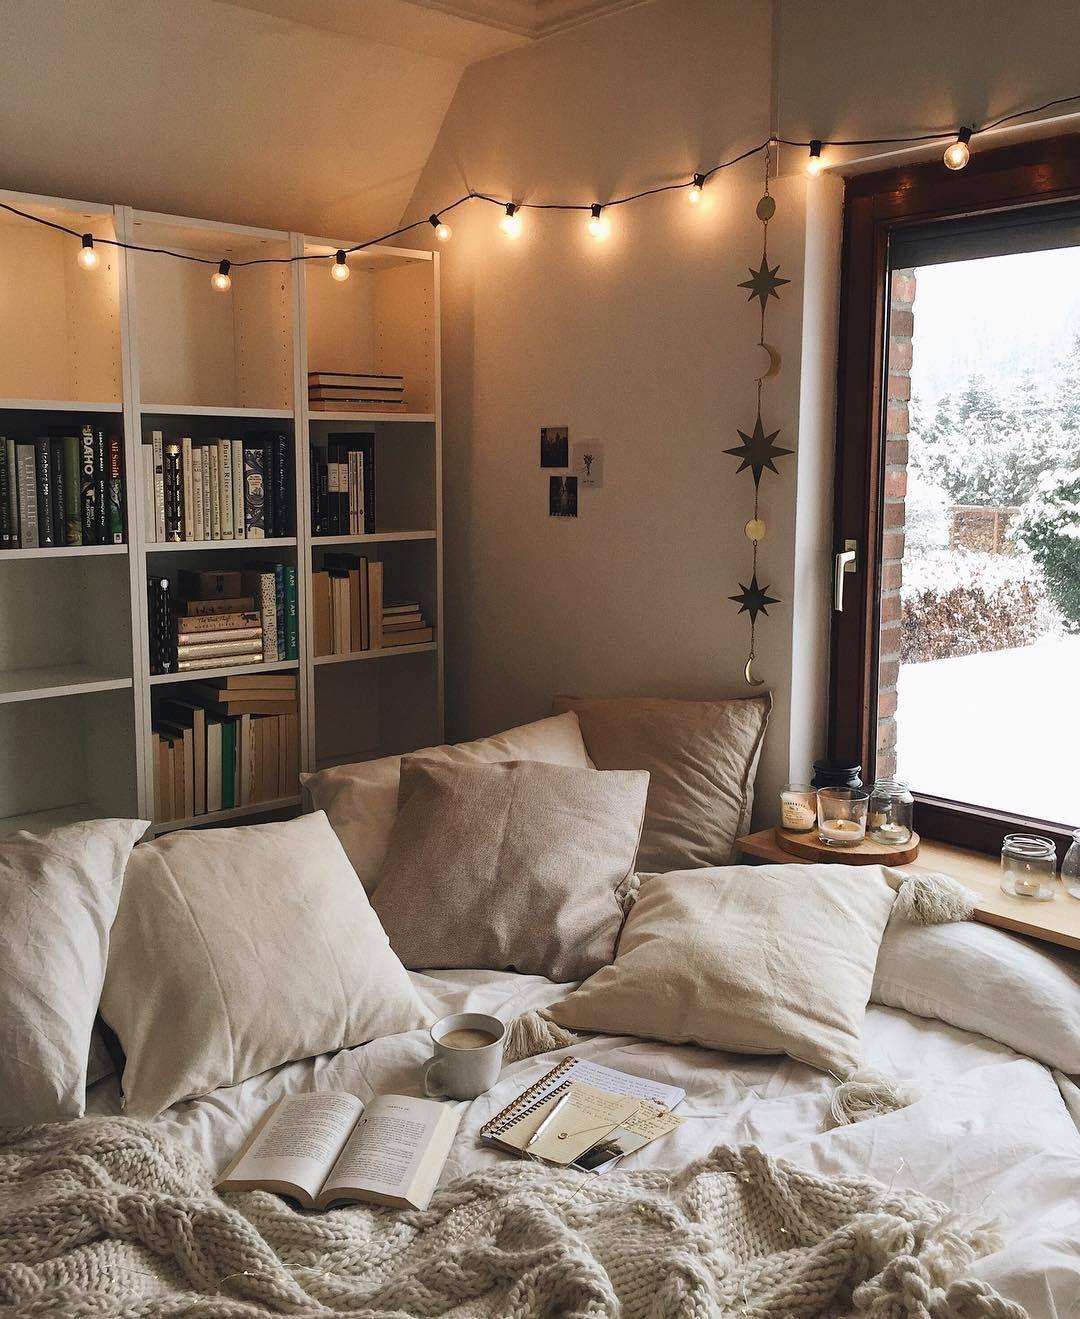 36+ Cute room decor aesthetic ideas in 2021